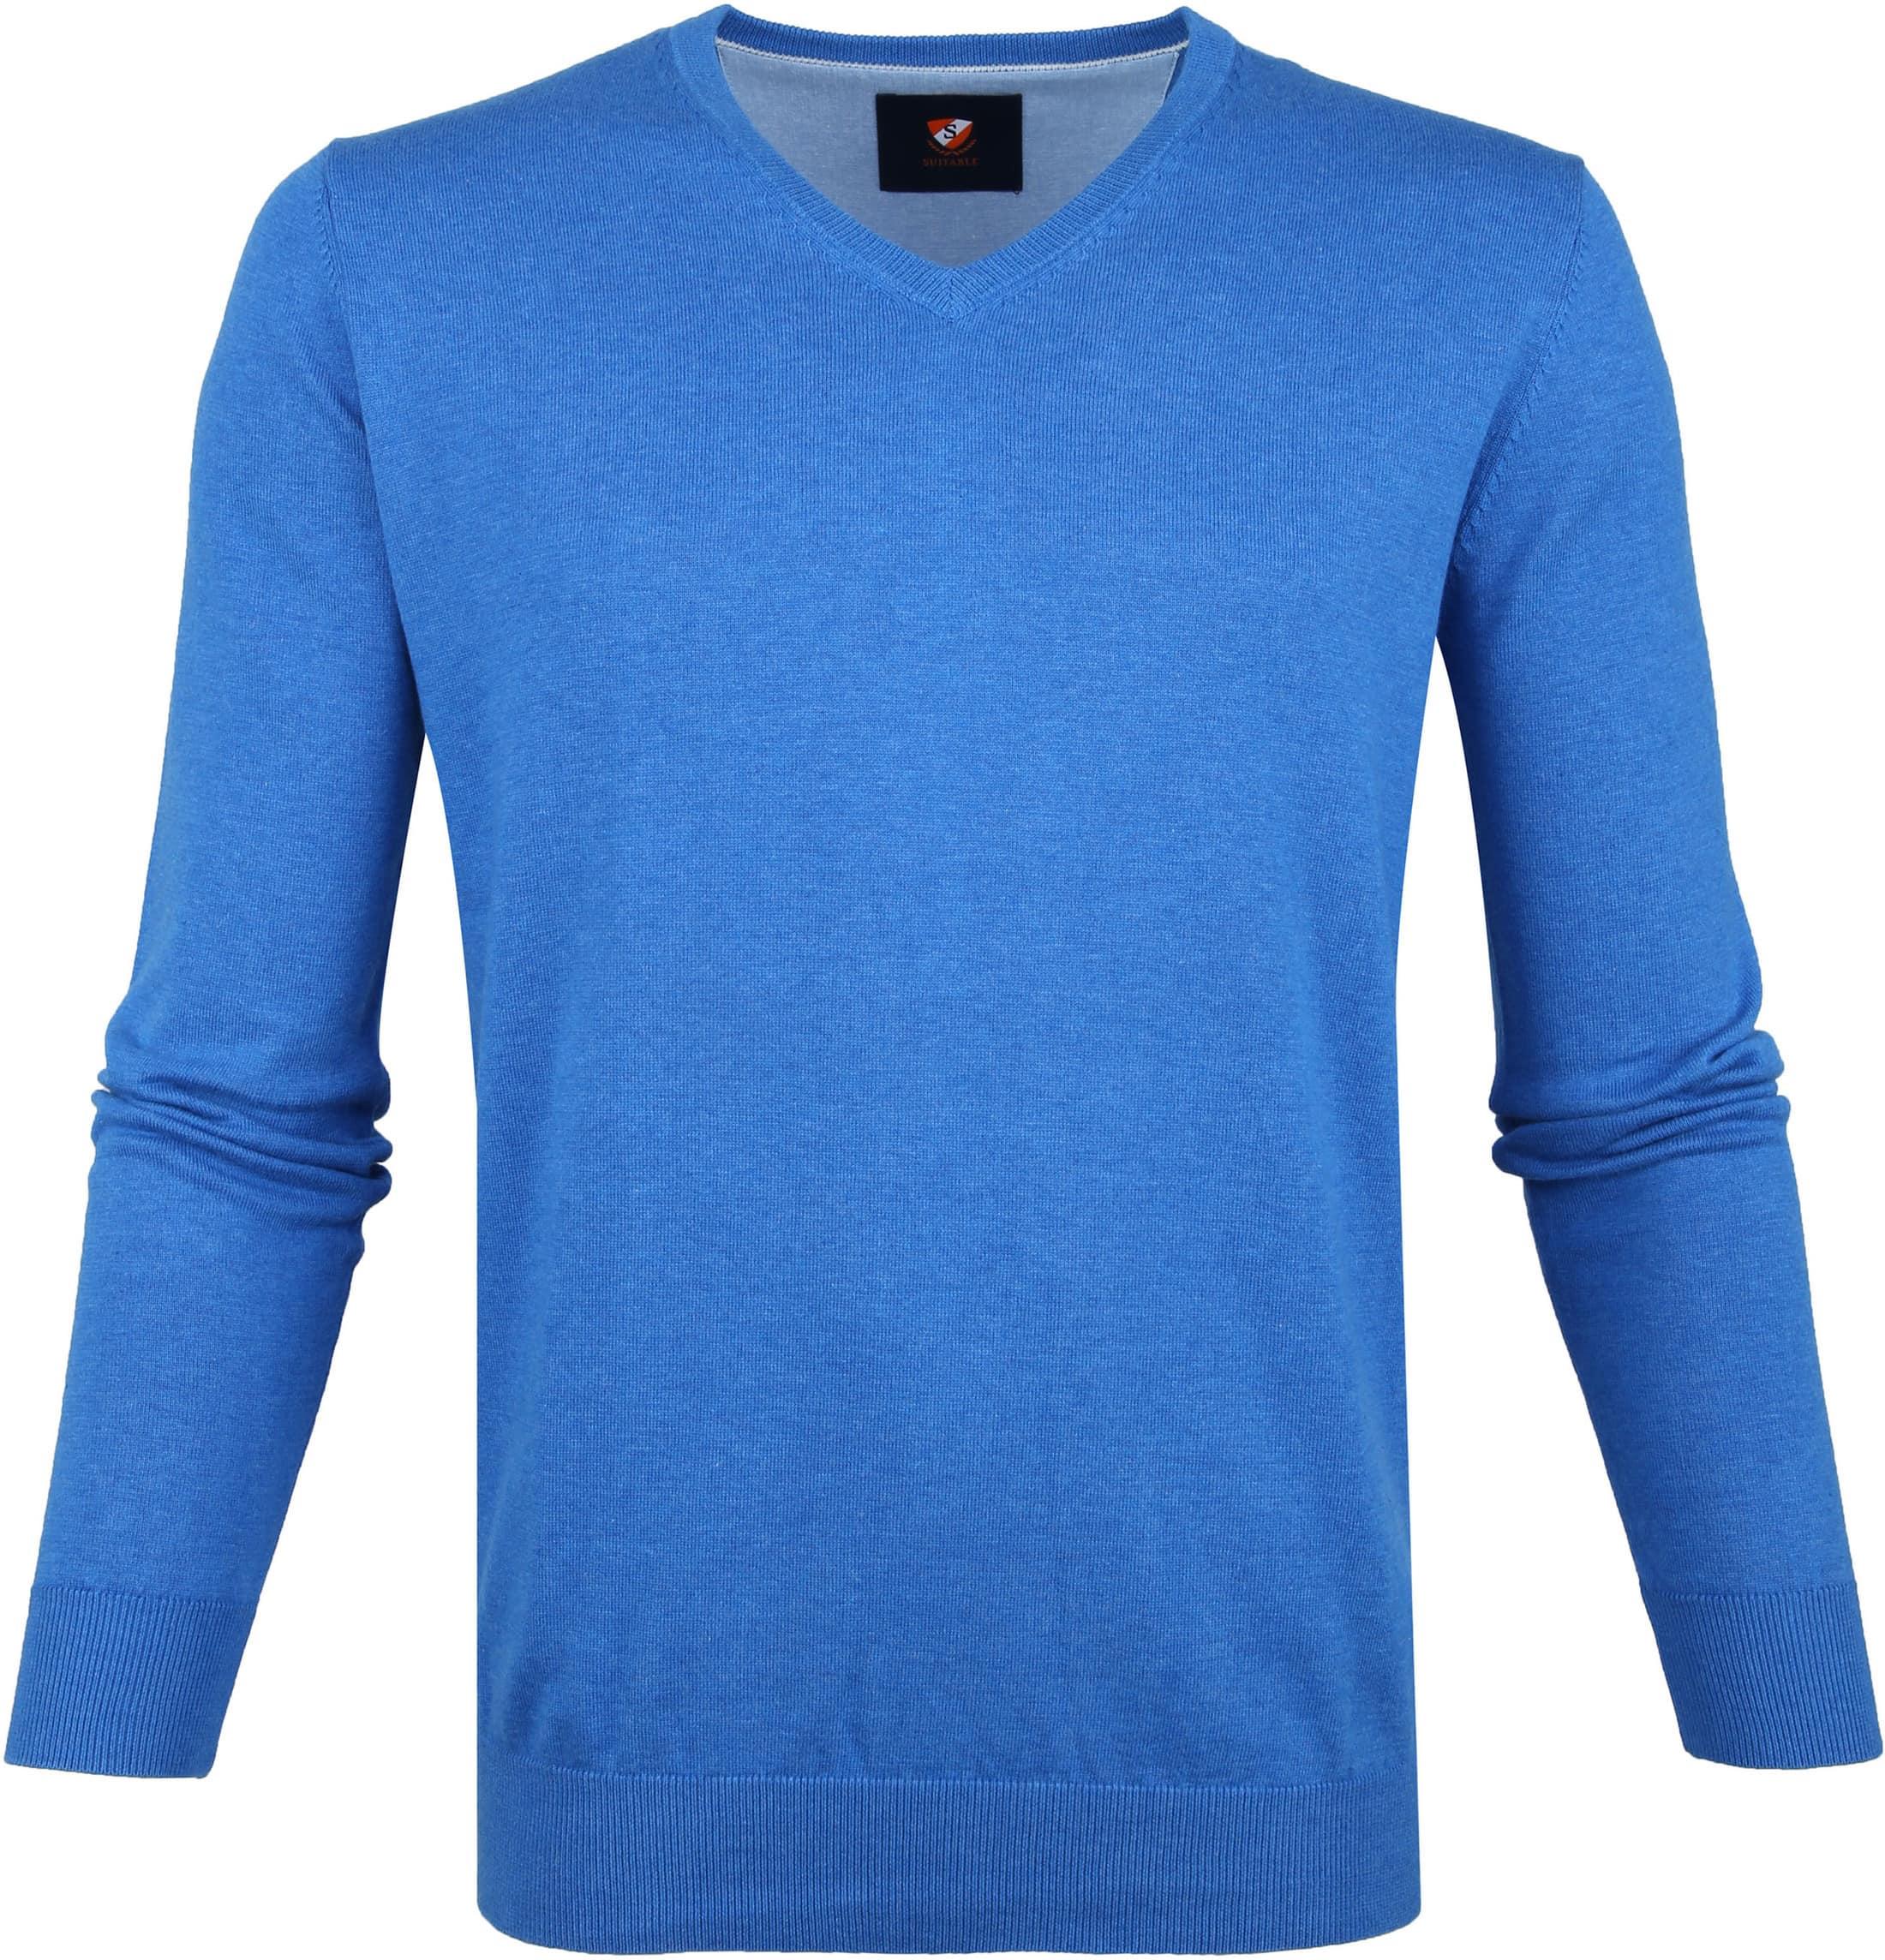 Suitable Baumwolle Vince Pullover Blau